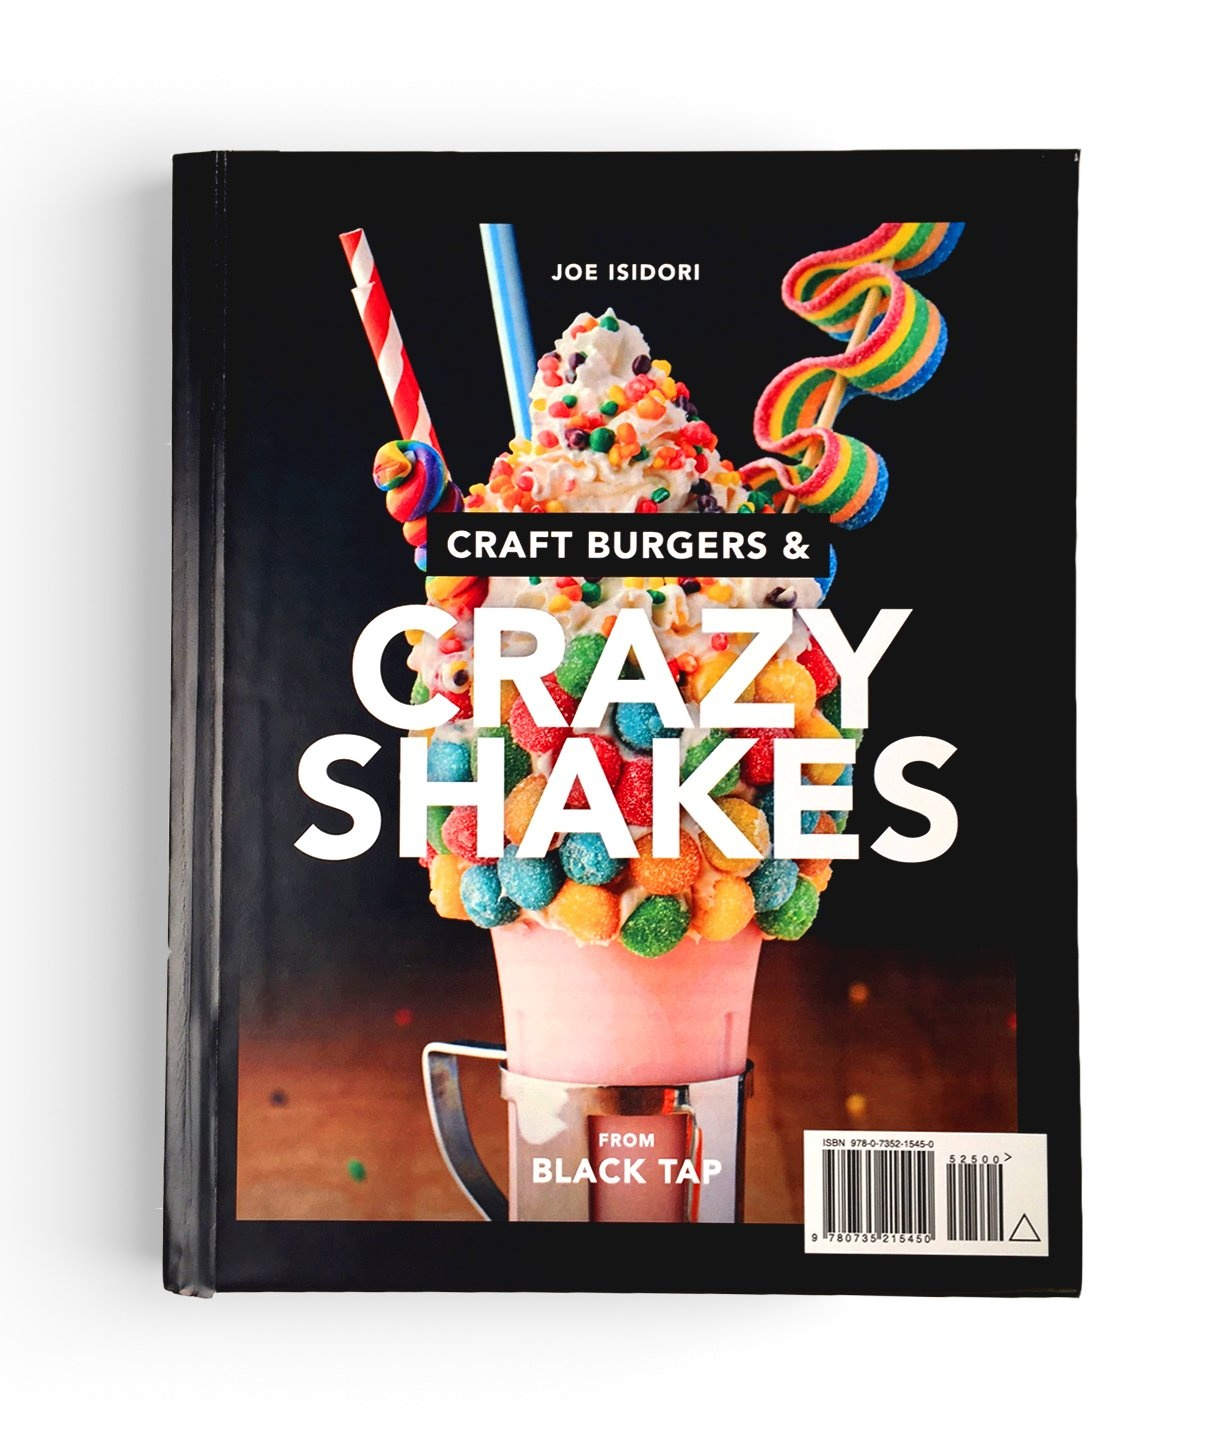 Craft Burgers & Crazy Shakes - Isidori